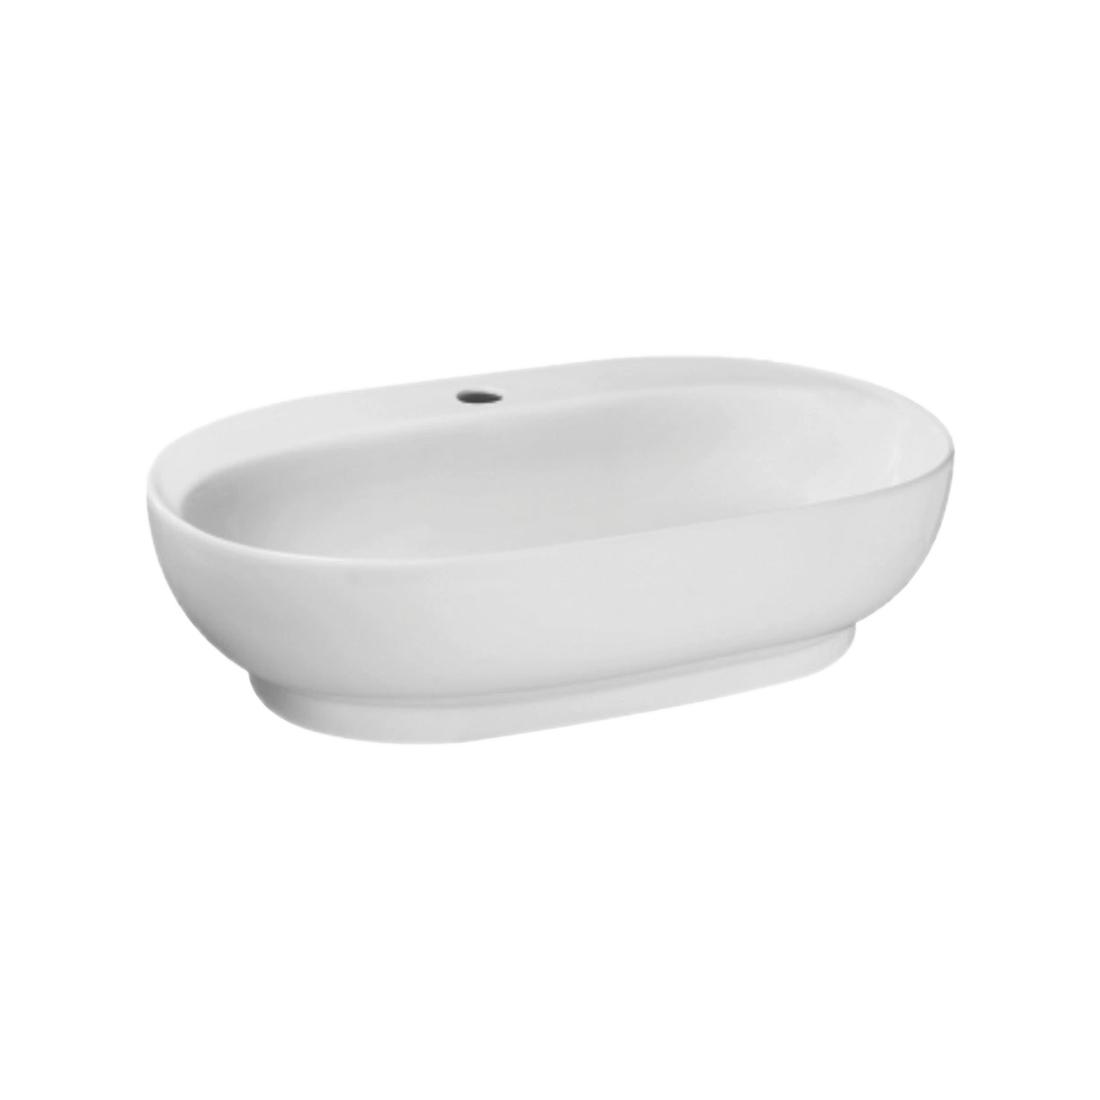 Kerovit Mark KS251 Counter Top Wash Basin